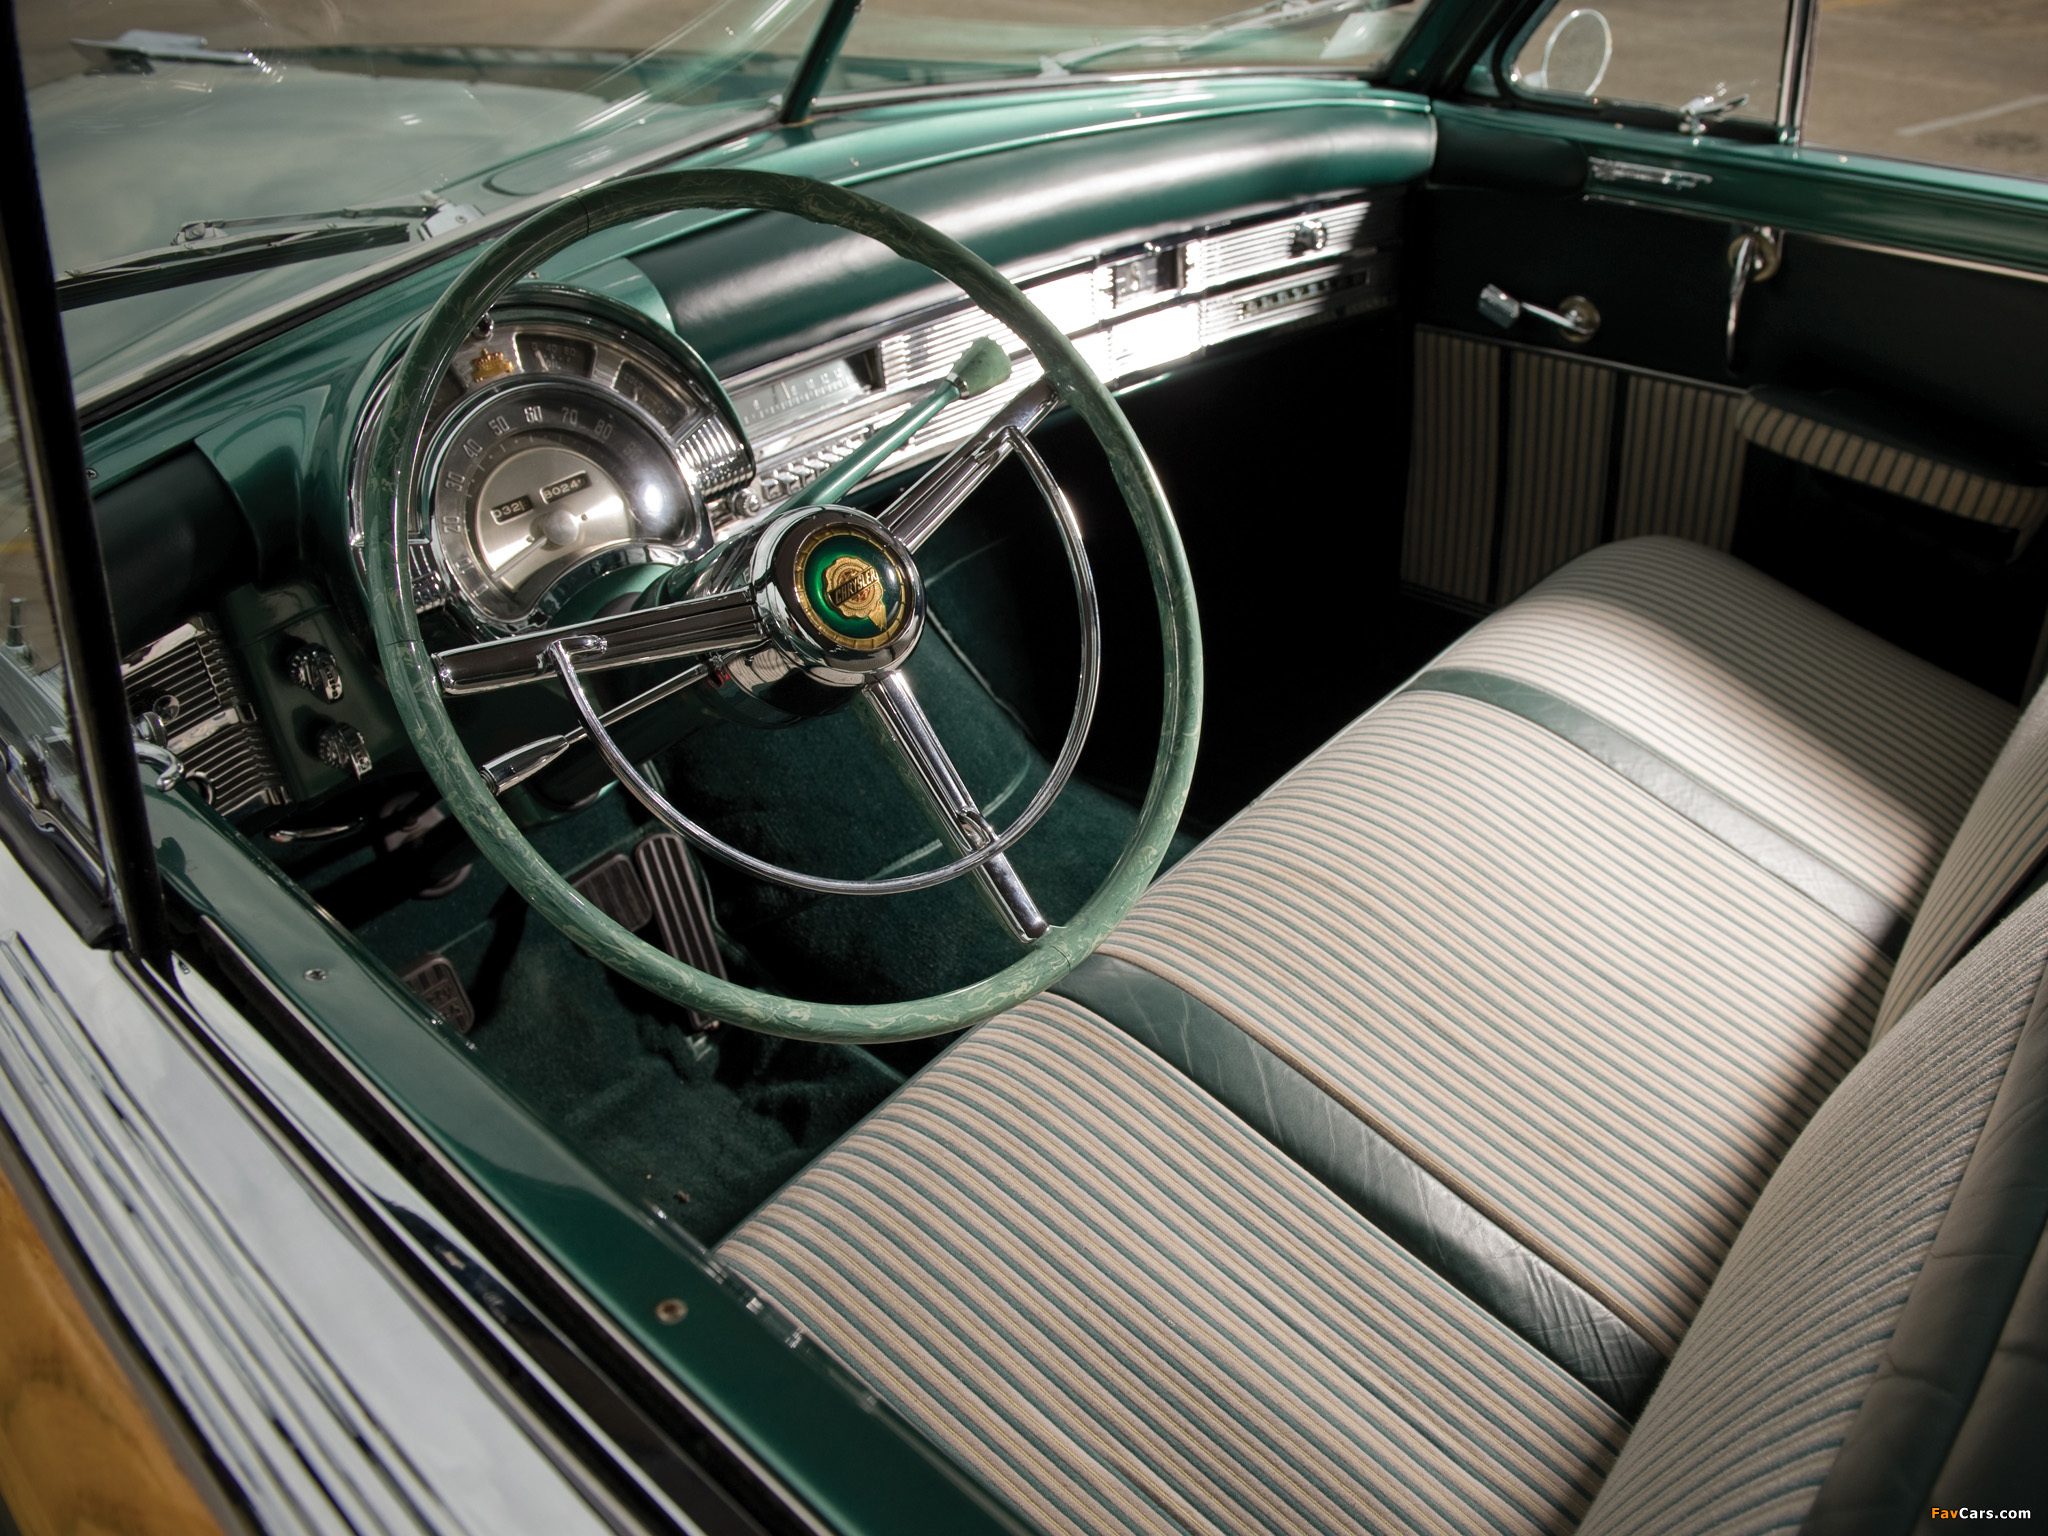 Chrysler Town & Country Newport Coupe 1950 photos (2048 x 1536)